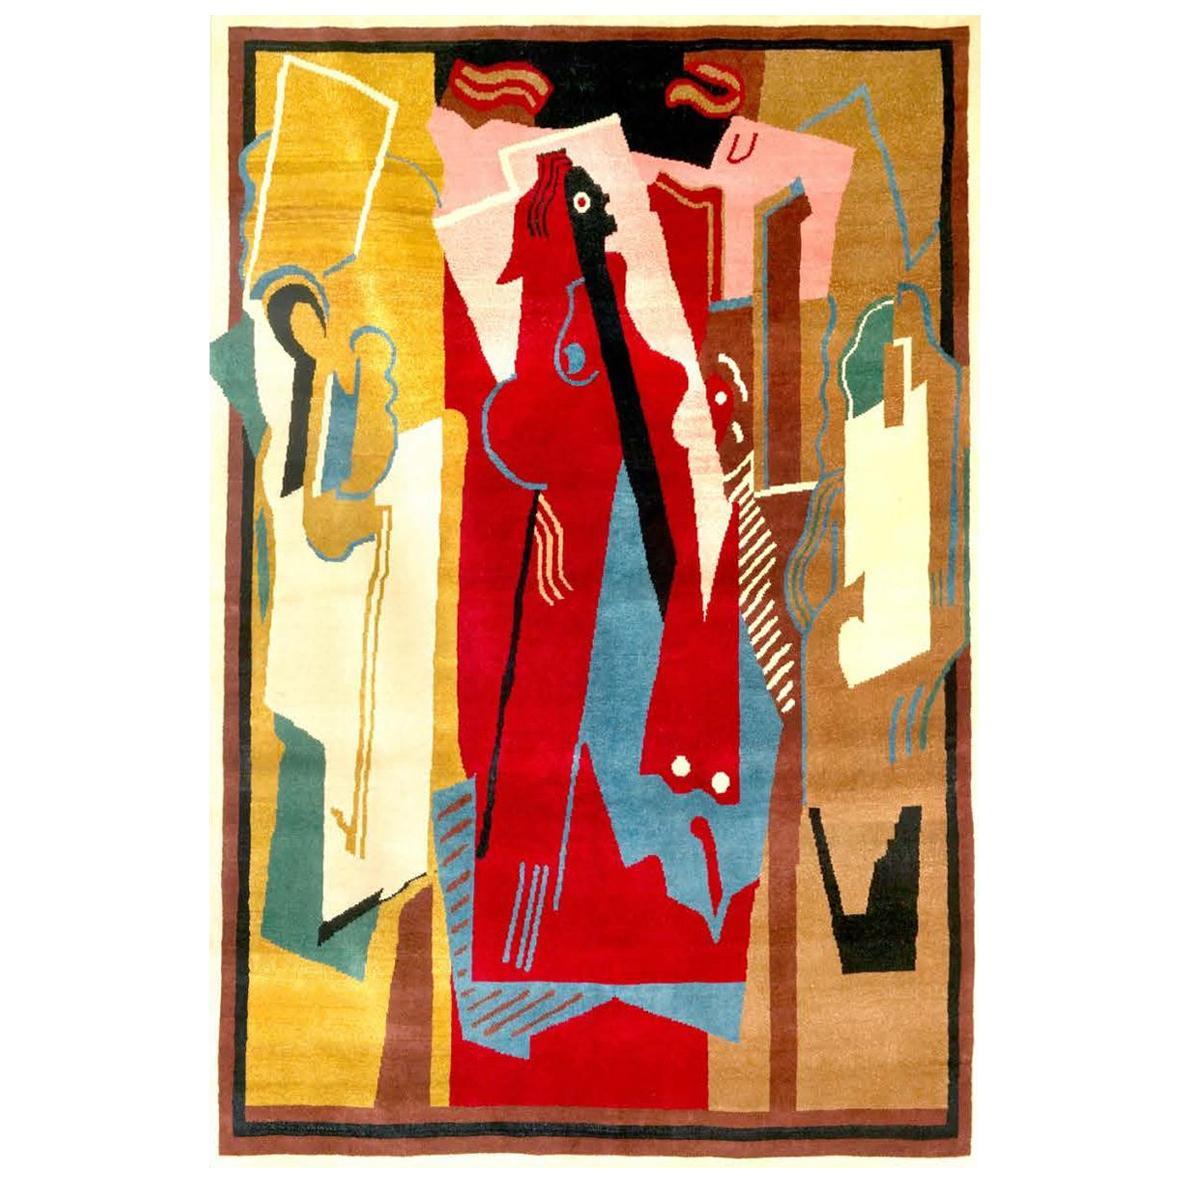 Boccara Limited Edition Artistic Handmade Wool Rug after Albert Gleizes - N.34